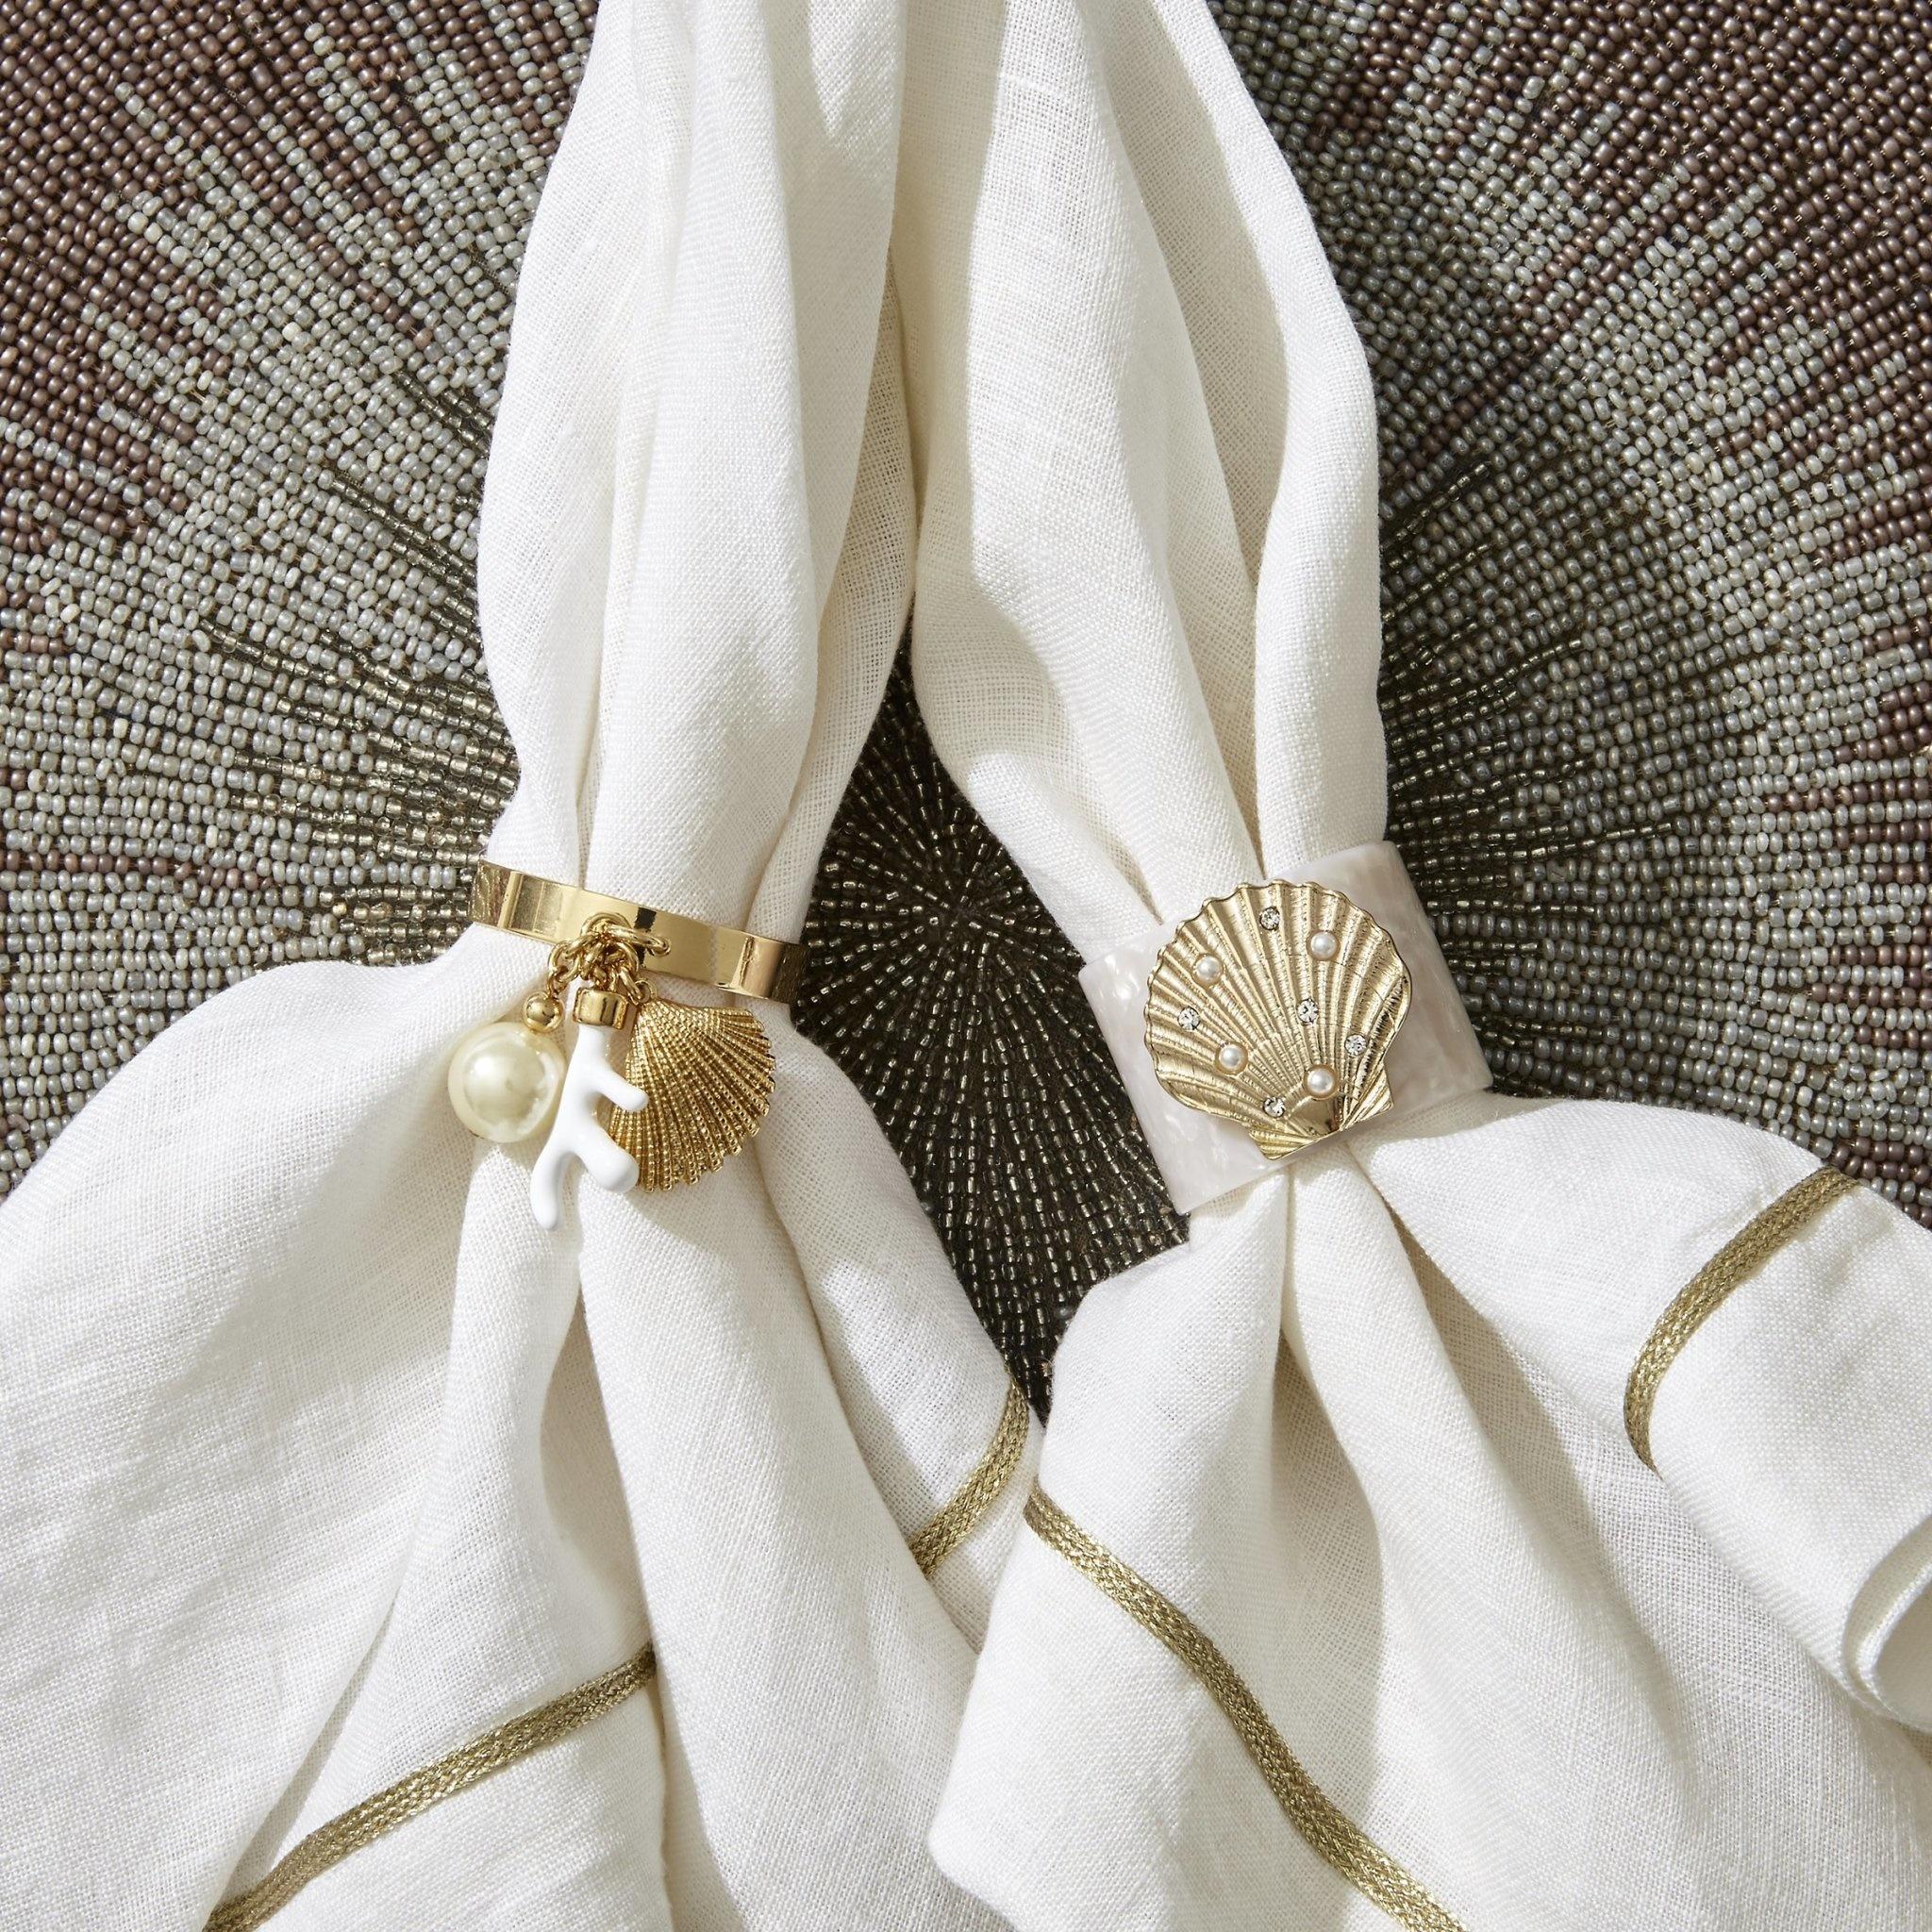 Napkin Ring Cream Coral Set 4pcs-3